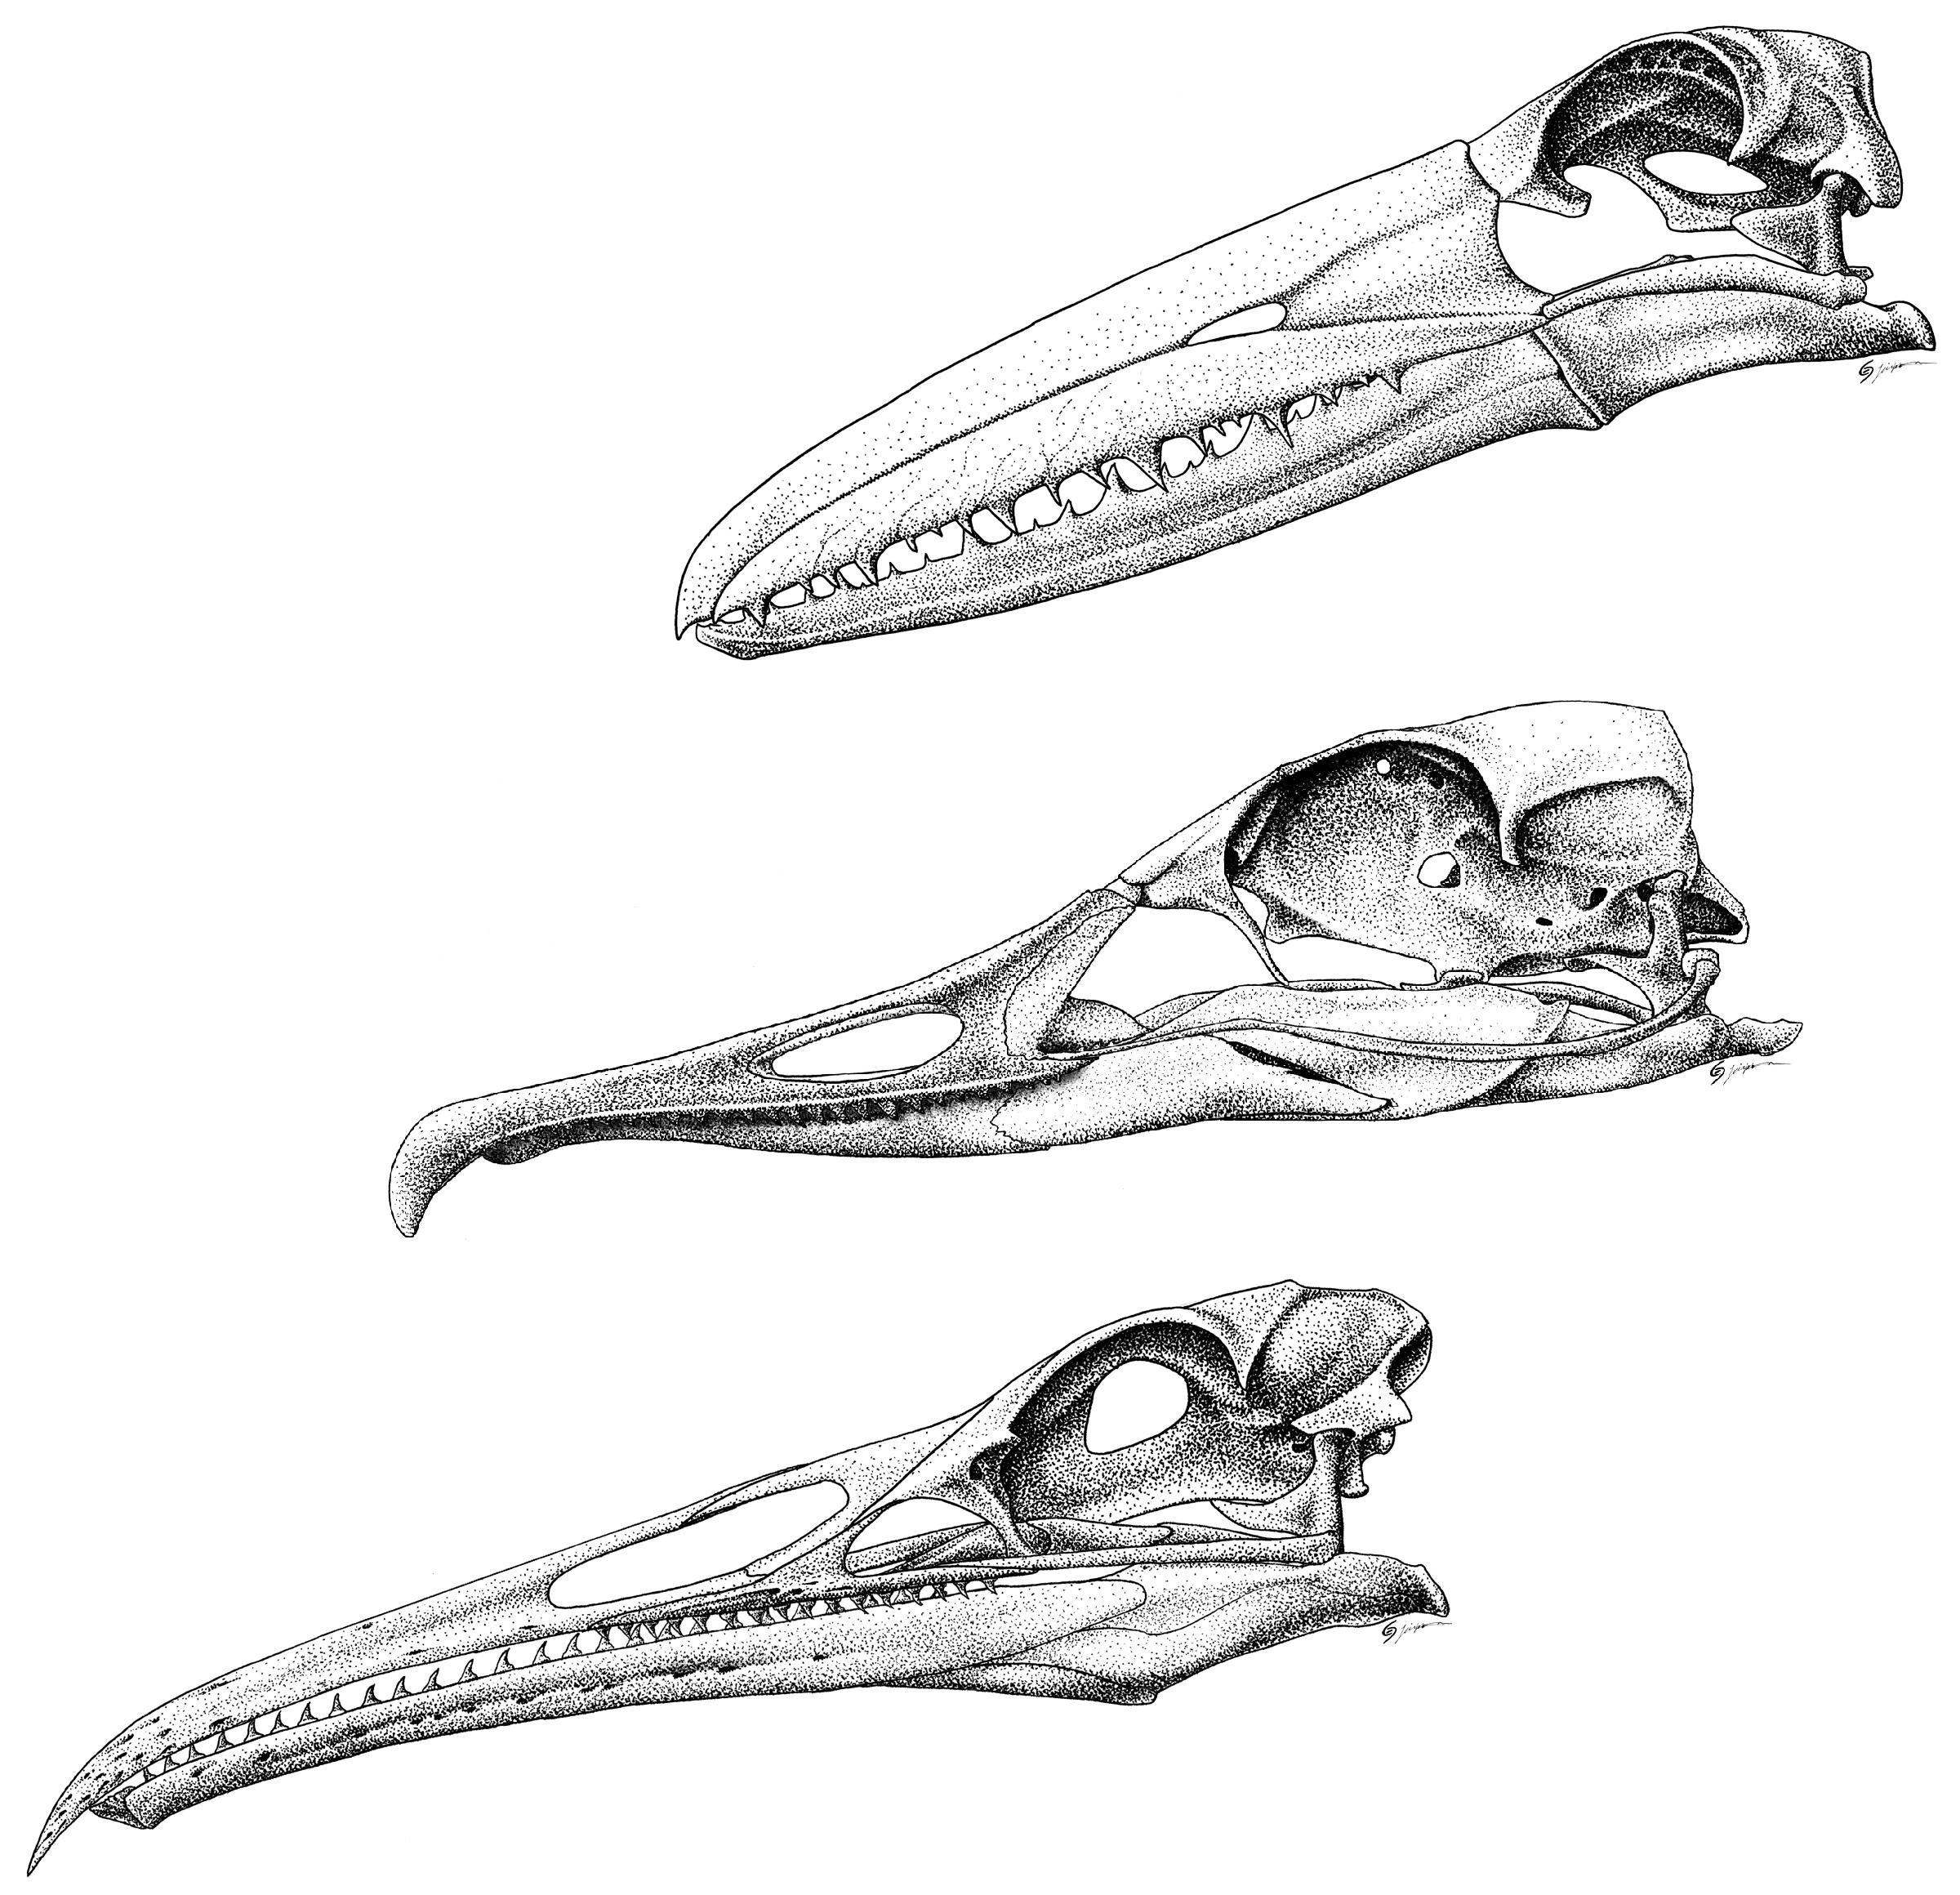 skulls-of-toothed-birds.png (2400×2320) | Birds | Pinterest ...